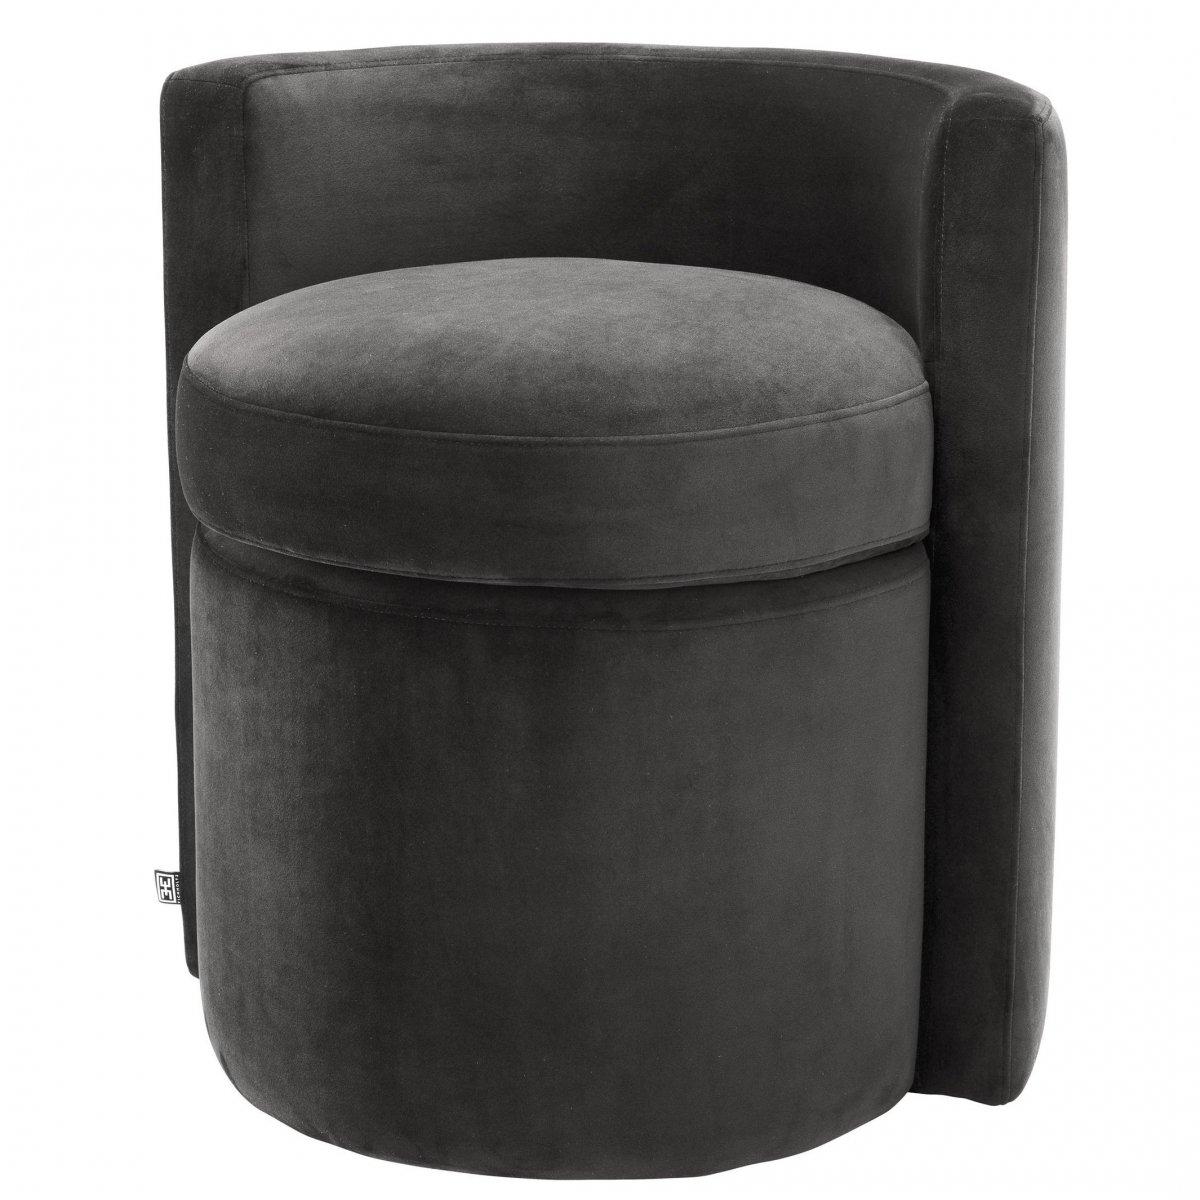 Кресло Eichholtz Stool Arcadia dark grey  - фото 1